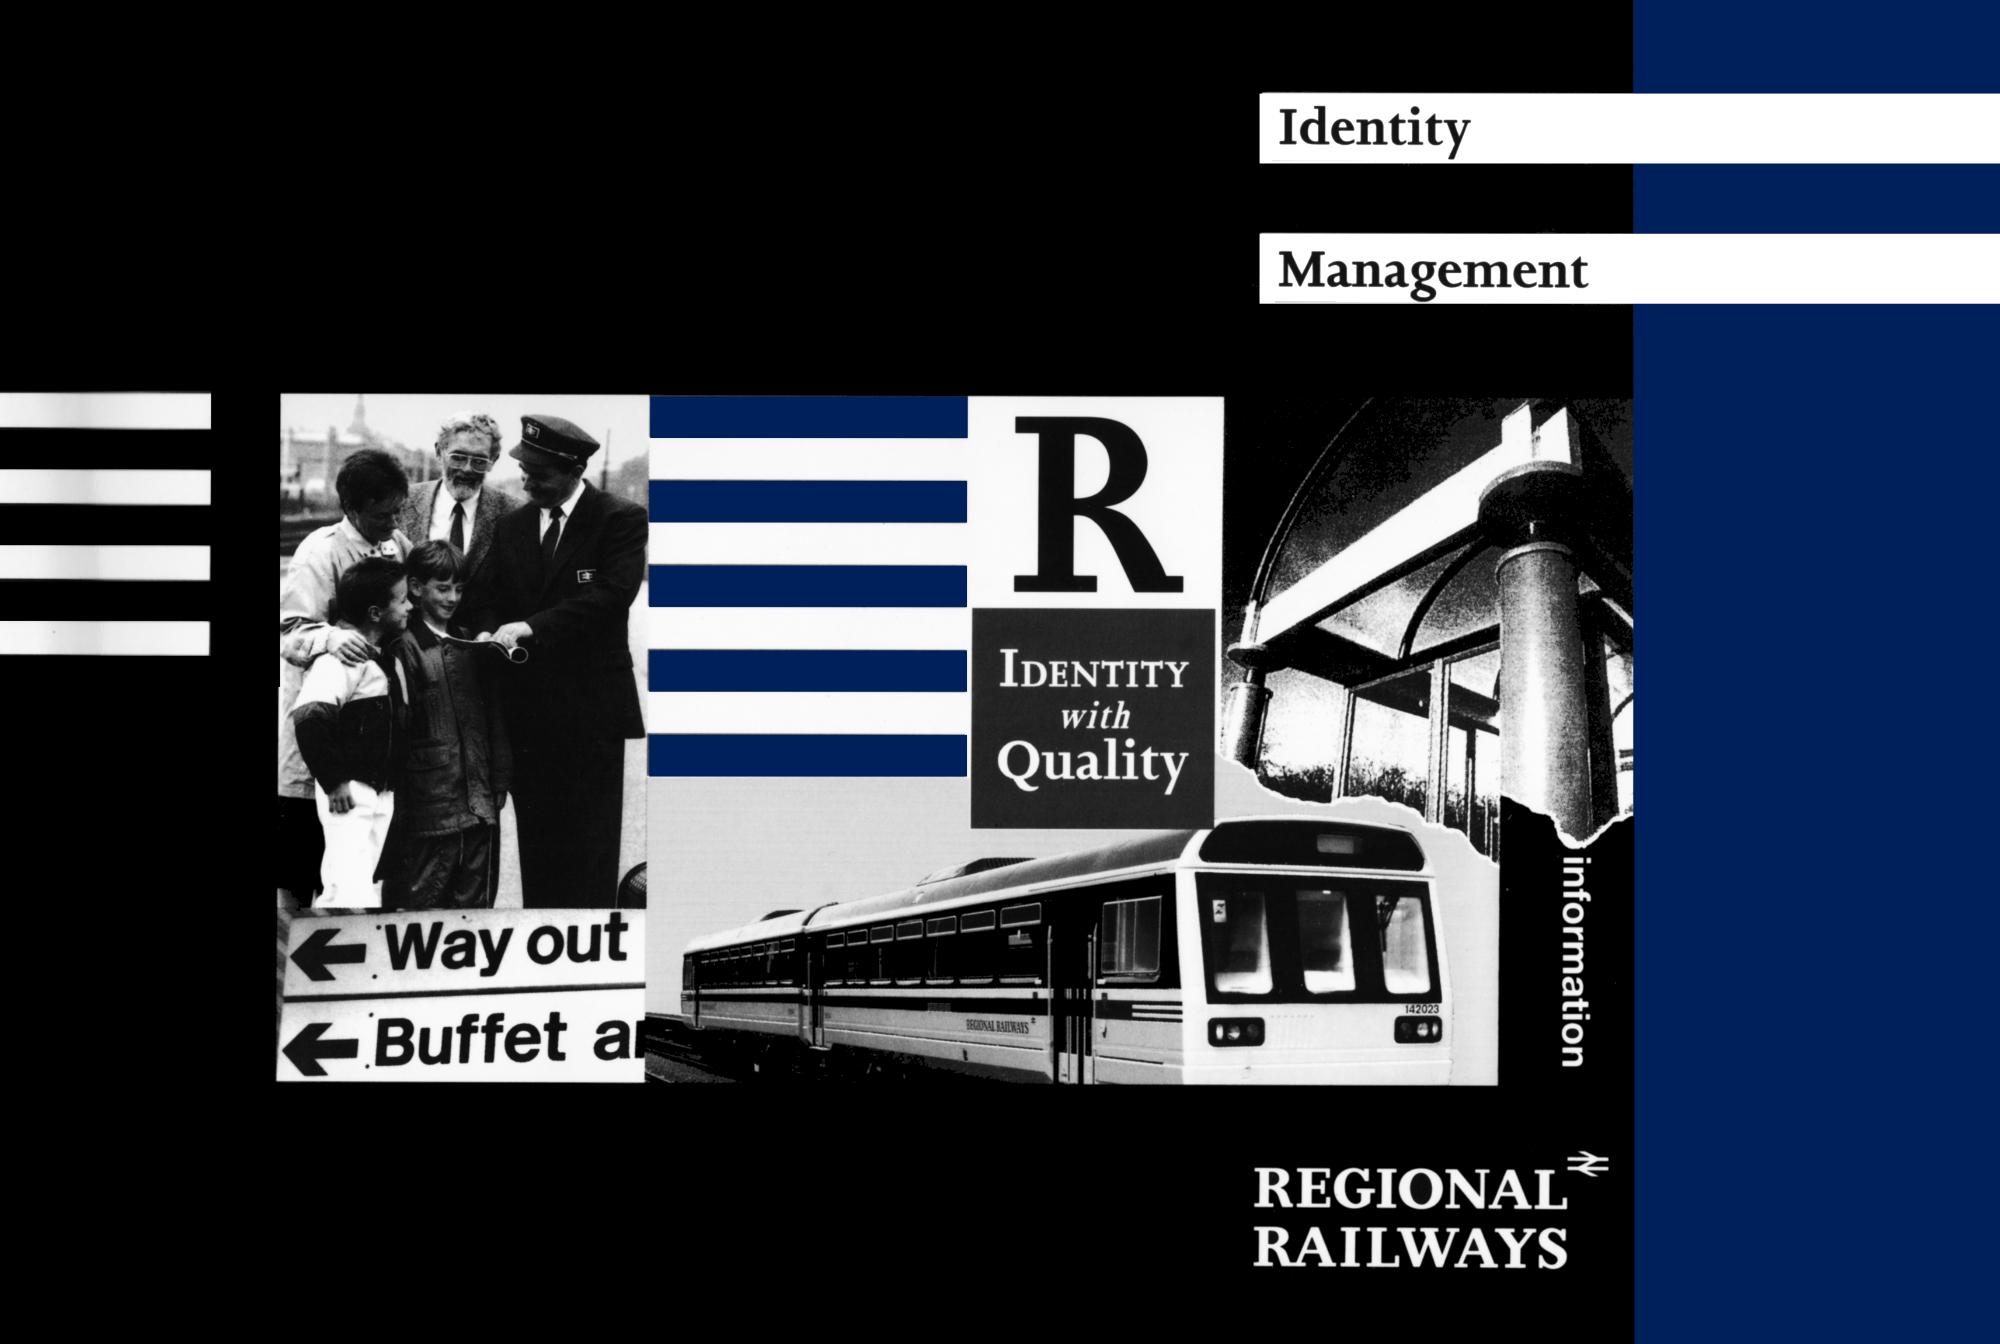 Regional Railways identity management